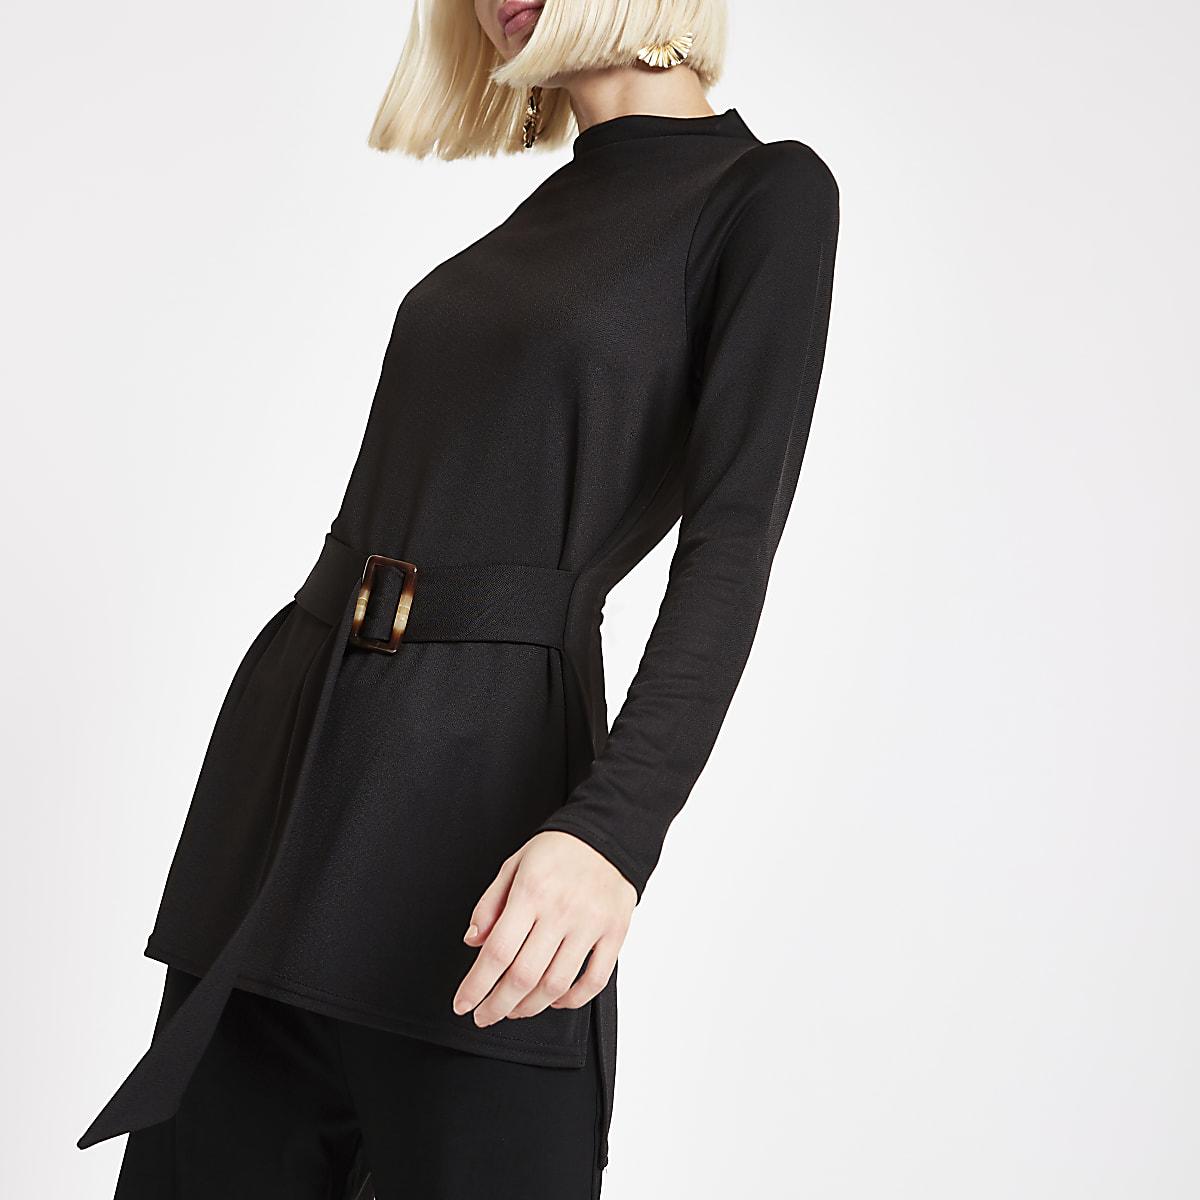 Schwarze, langärmlige Tunika mit Gürtel